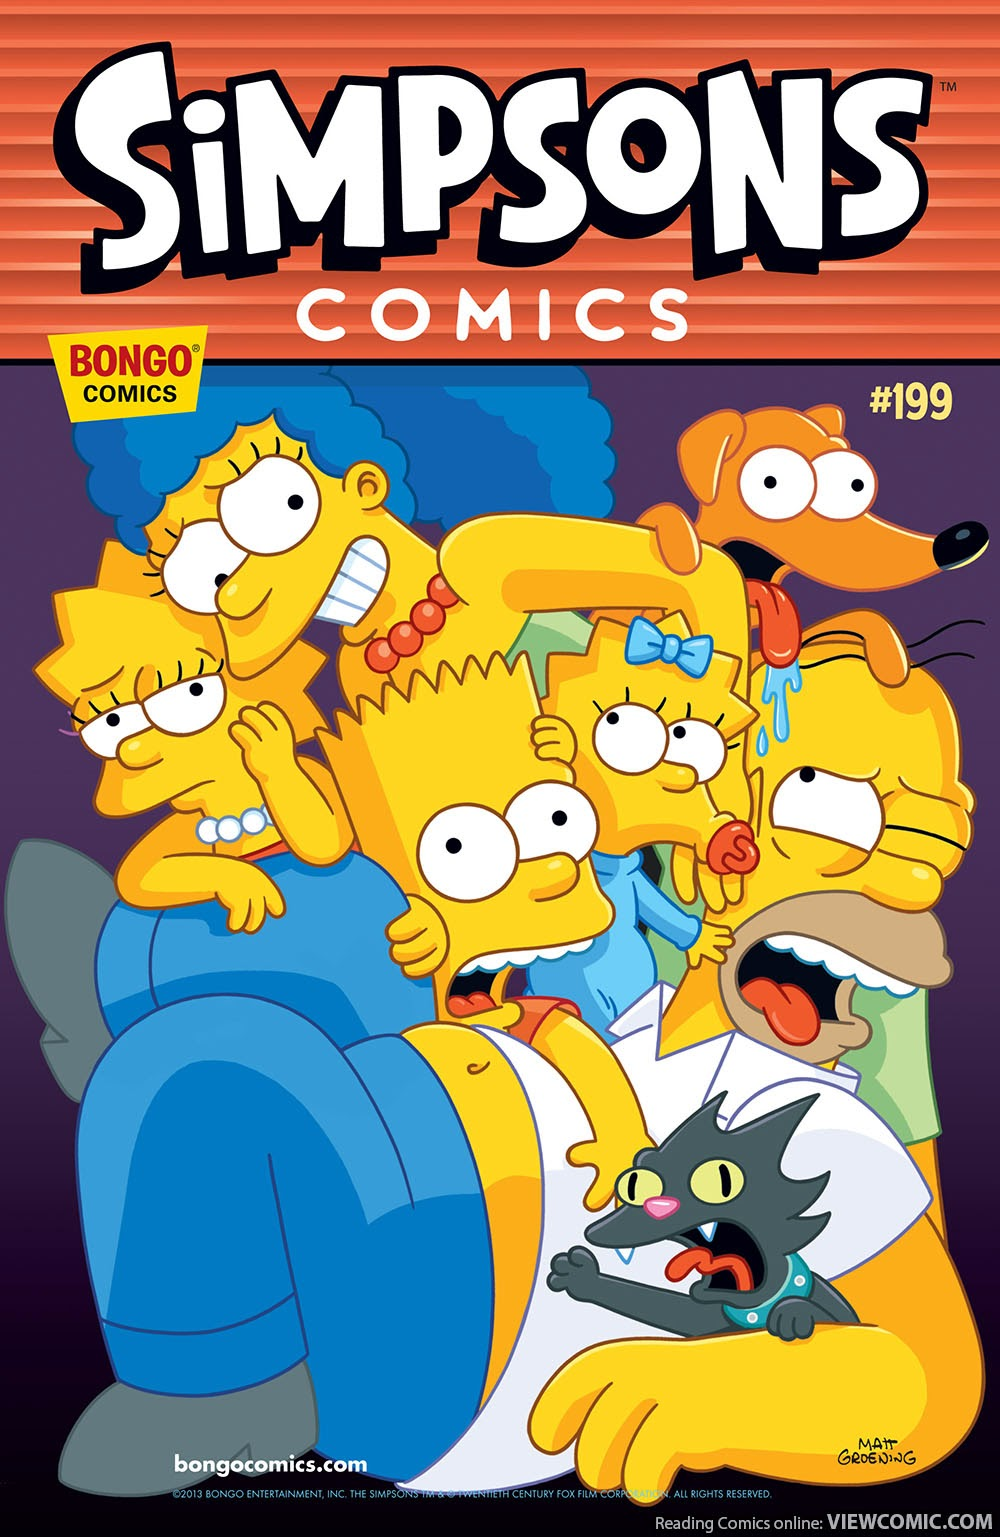 Uncategorized Simpsons Online simpsons comics viewcomic reading online for free 199 2013